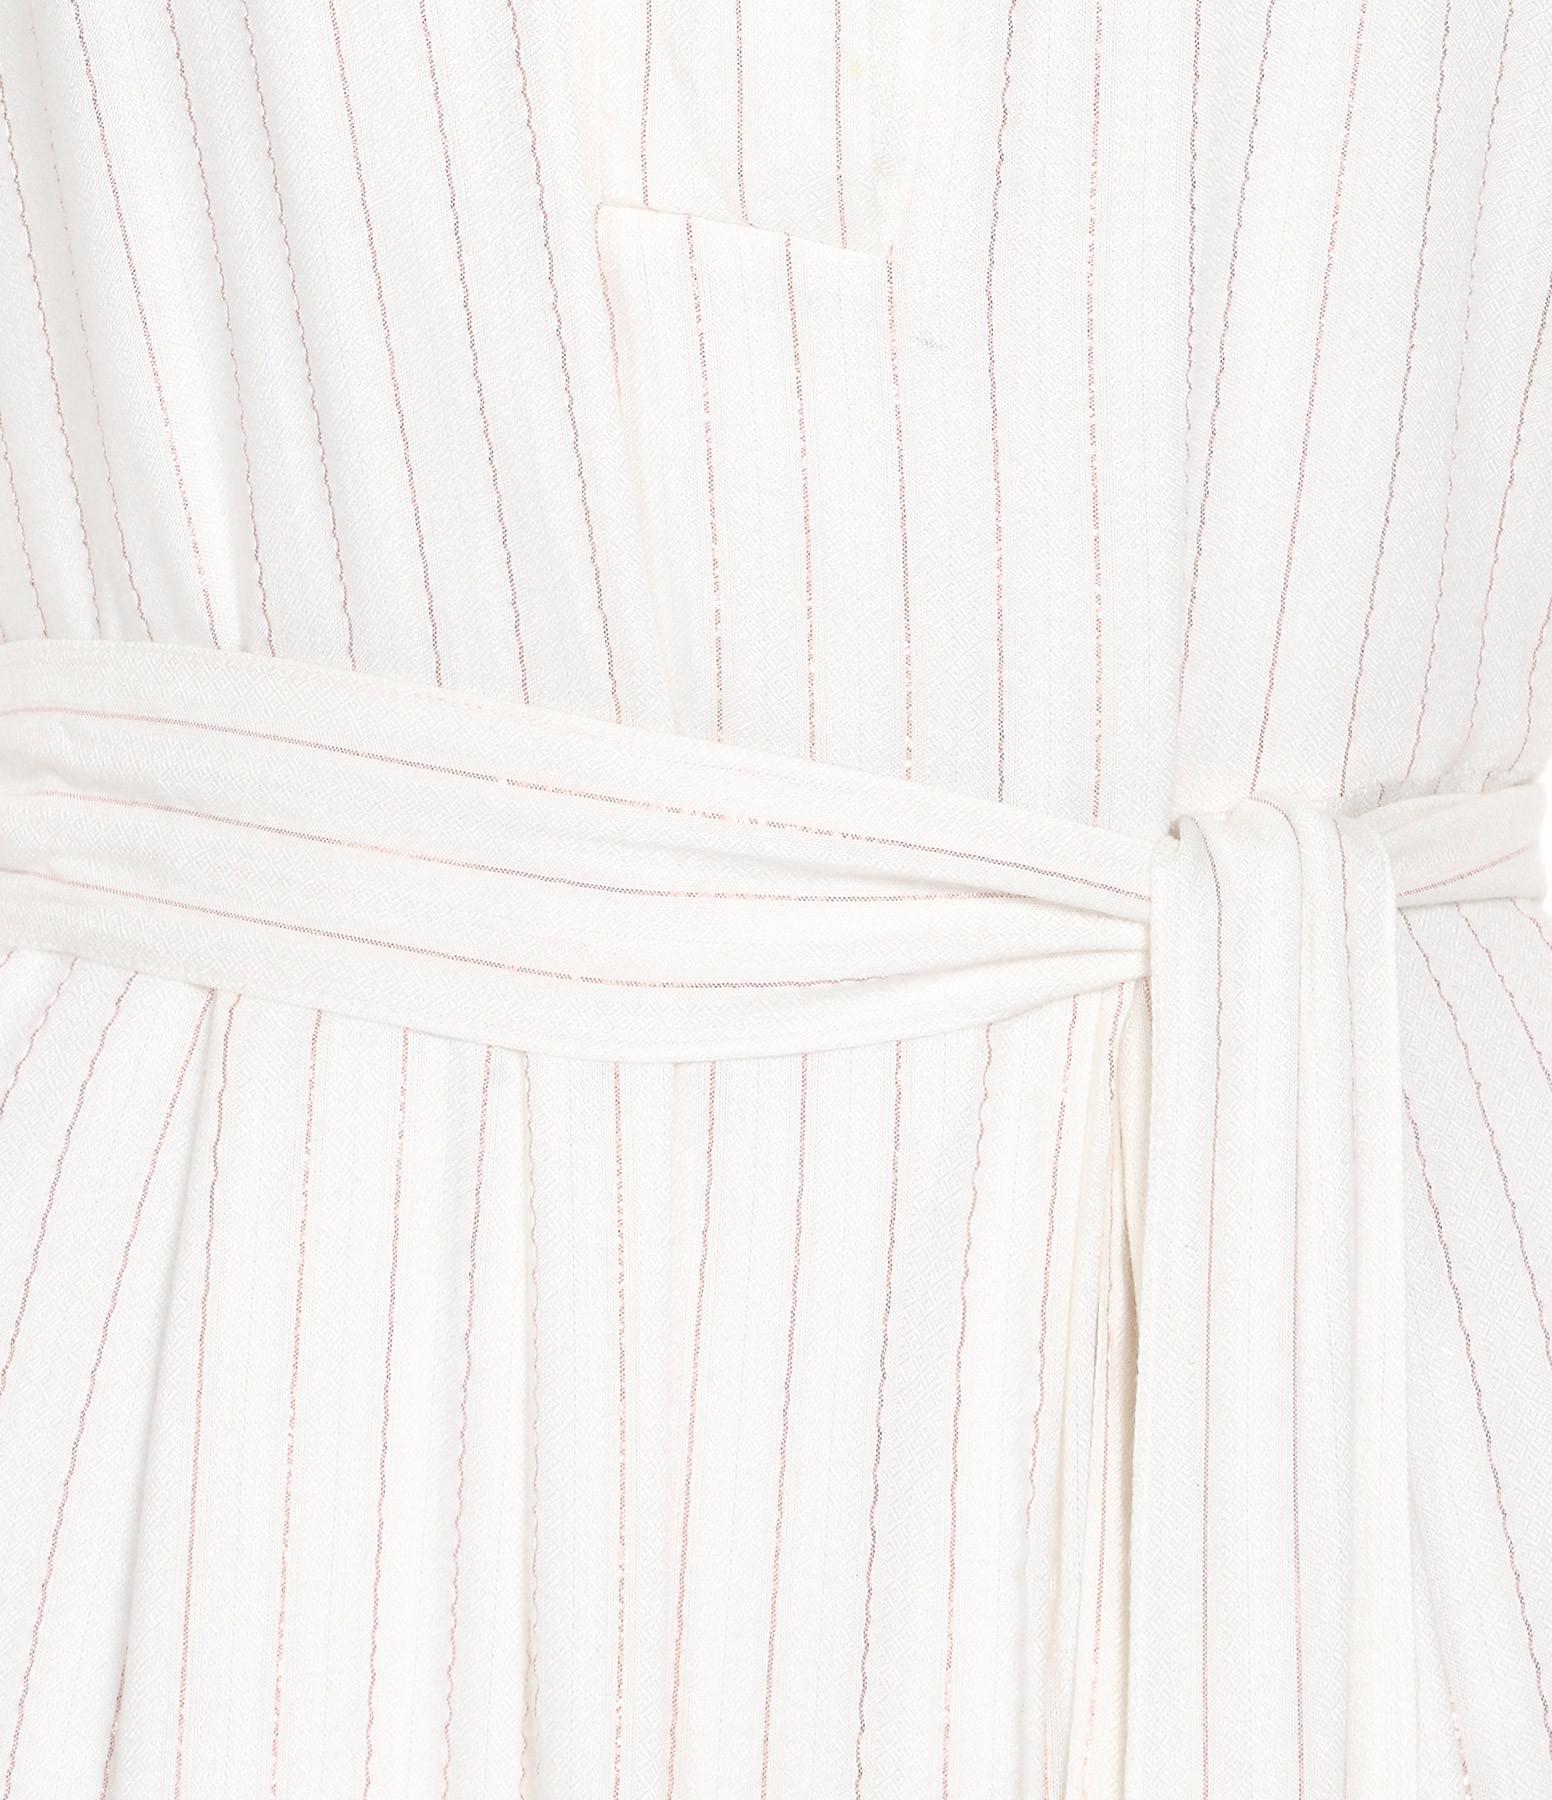 RABENS SALONER - Robe Eris Cuivre Blanche